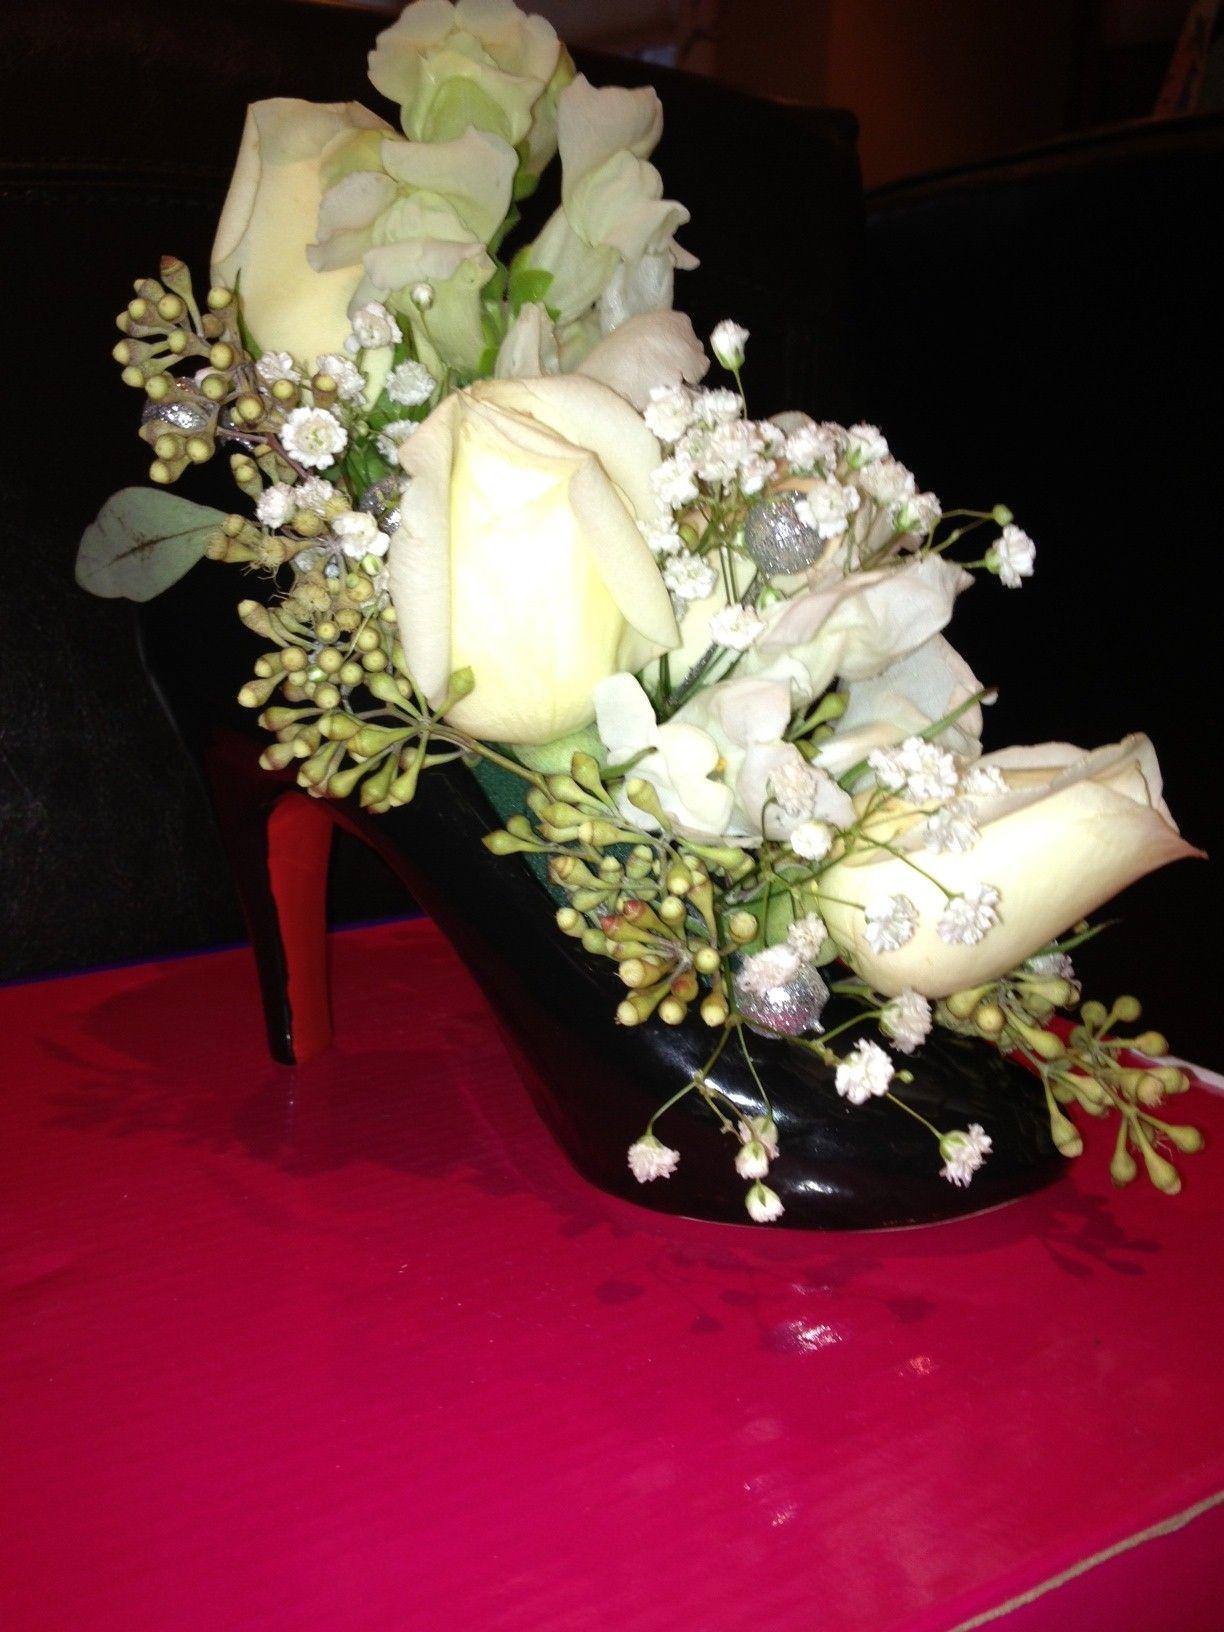 Pennock Floral (pennockfloral) na Pinterestu